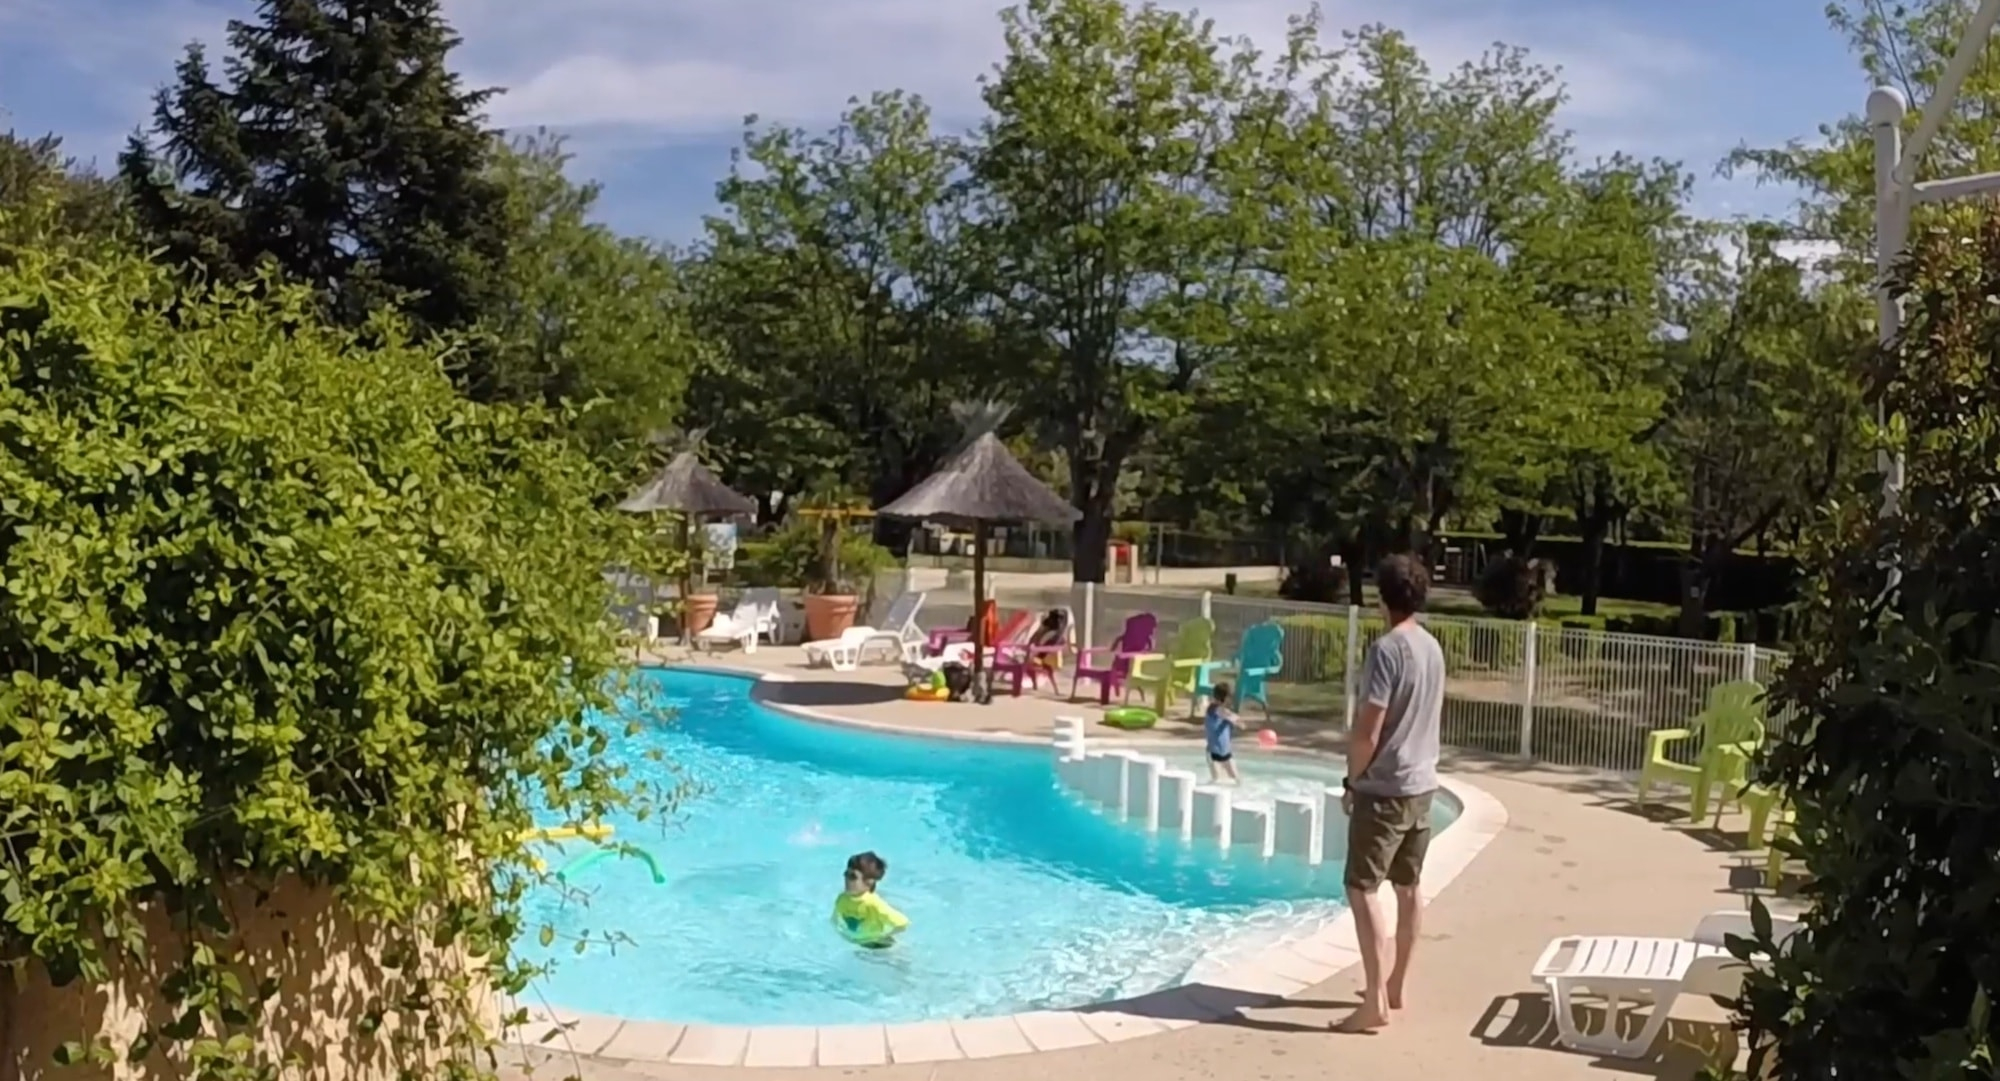 Camping Ardèche 3 Étoiles À Sampzon | Sun Camping tout Camping En Ardèche Avec Piscine